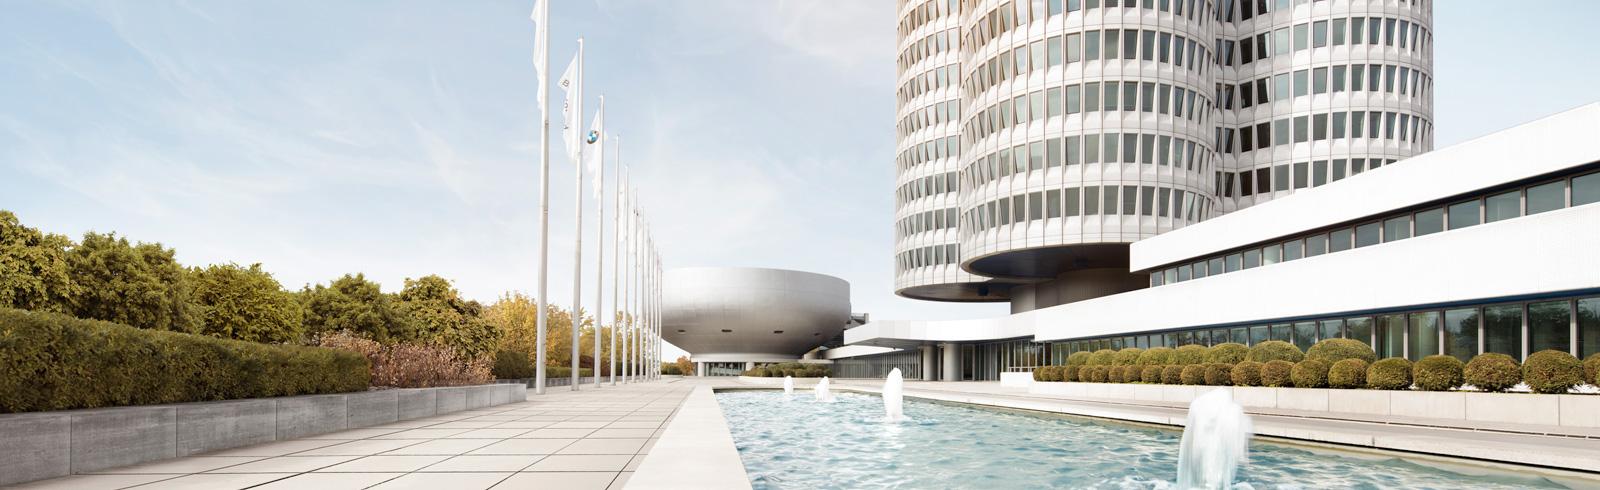 BMW and Northvolt sign a 2 billion euros deal for EV batteries supply from 2024 on